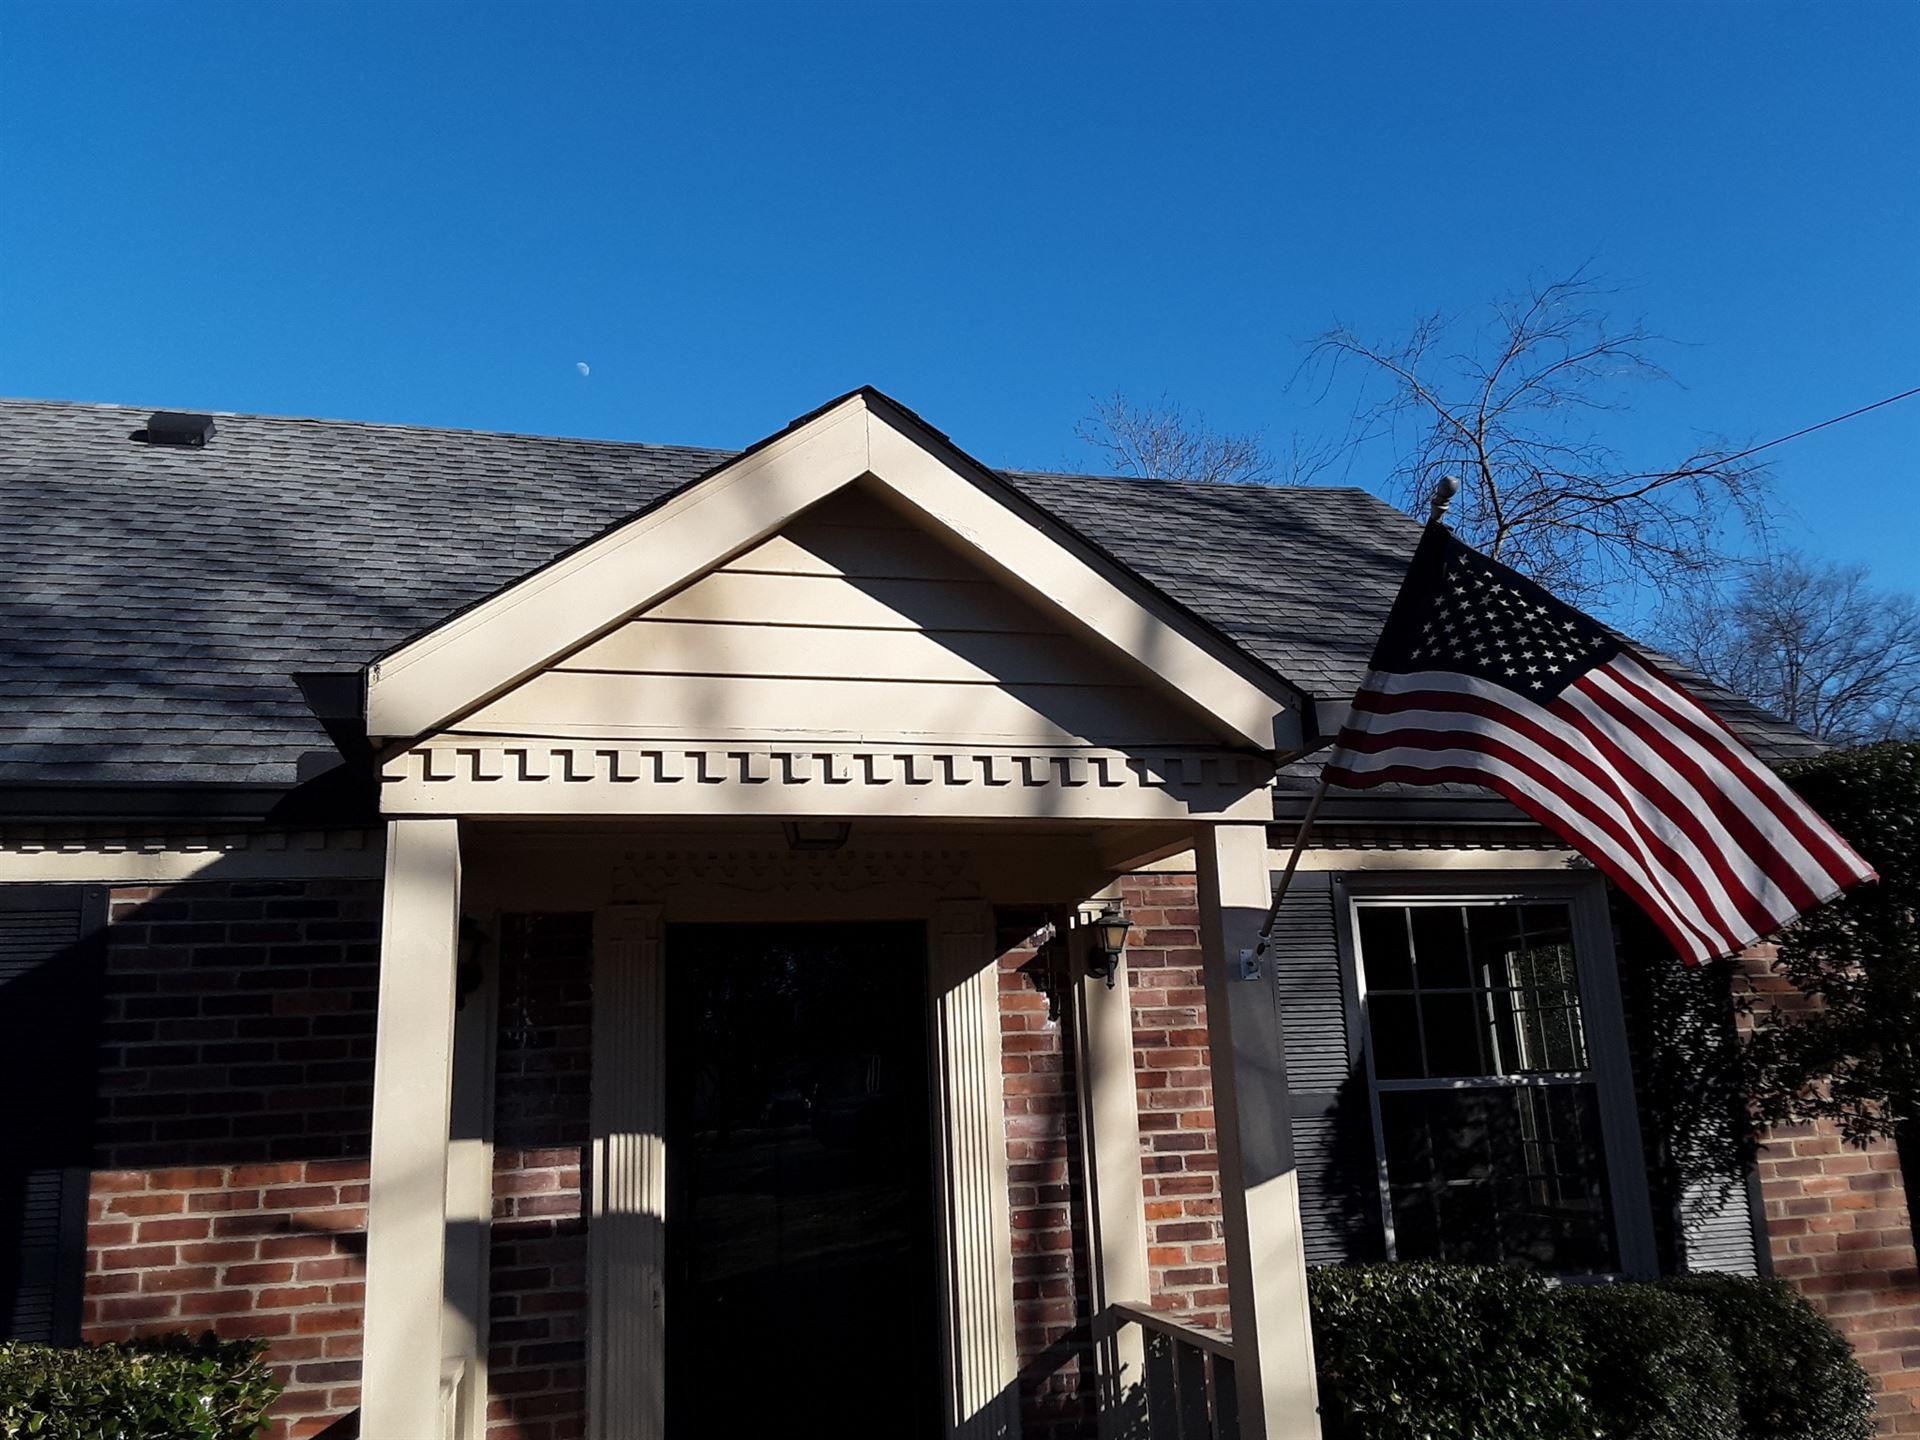 4806 Tanglewood Dr, Nashville, TN 37216 - MLS#: 2222971